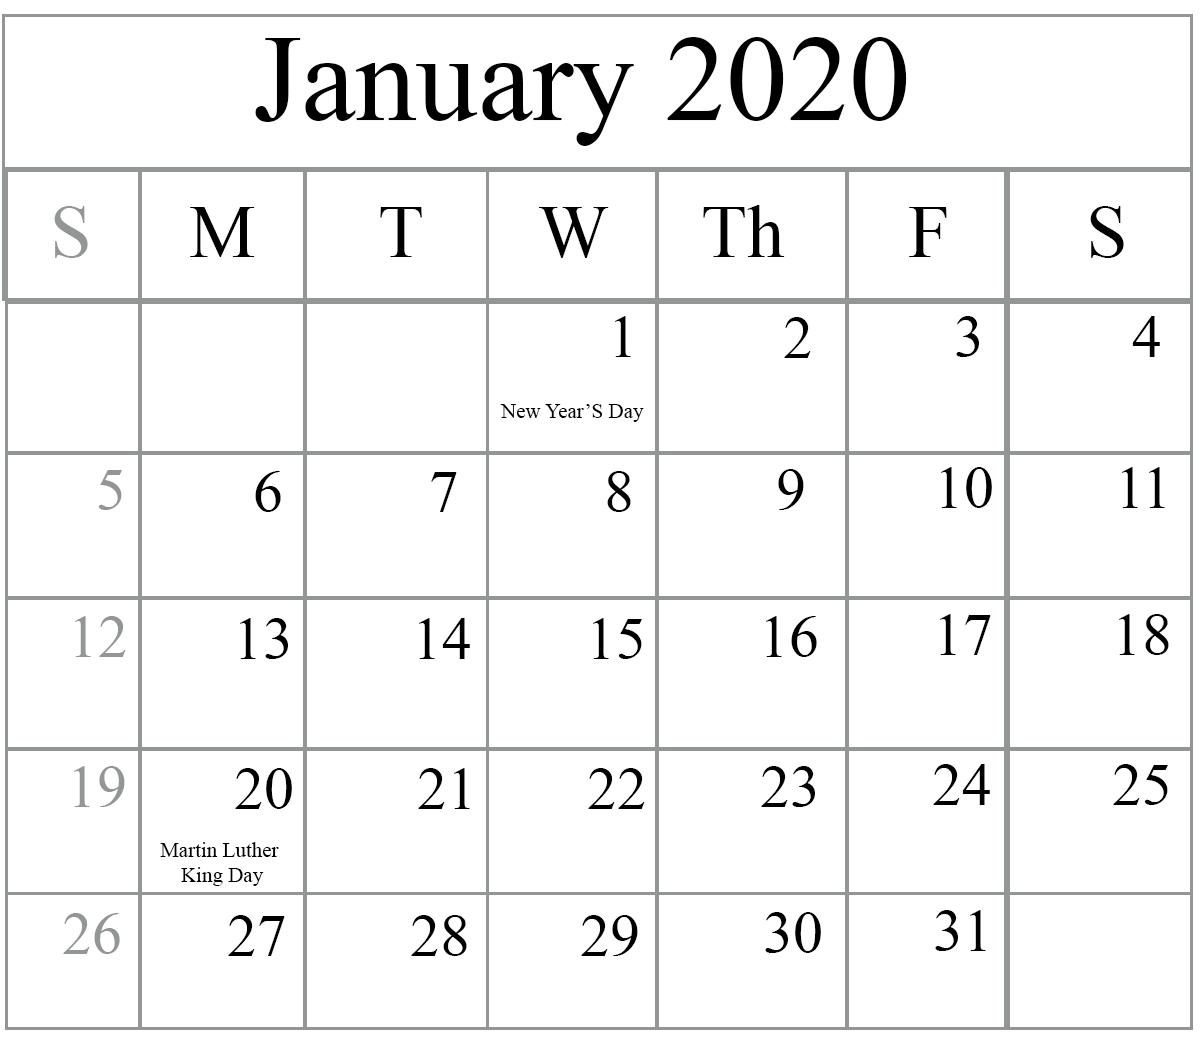 Free January 2020 Printable Calendar In Pdf, Excel & Word-January 2020 Calendar Holidays